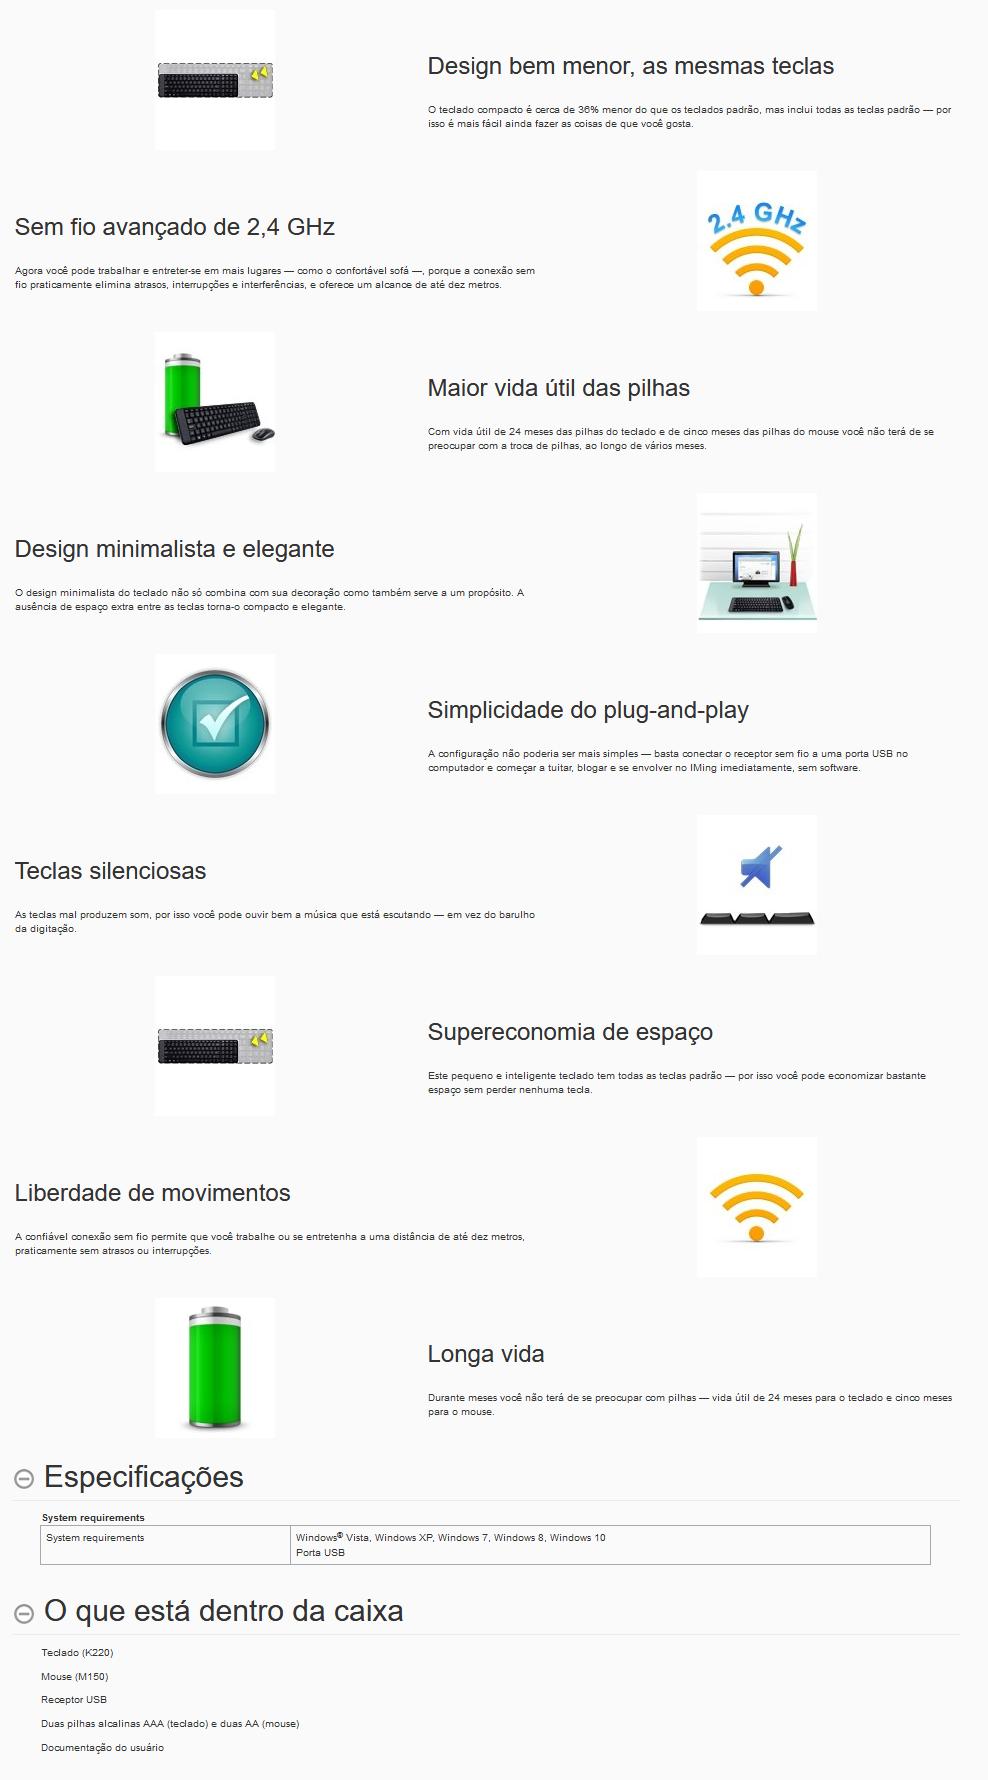 https://i.ibb.co/FgvvFWq/Screenshot-2020-07-01-KIT-TECLADO-E-MOUSE-S-FIO-MK220-PRETO-LOGITECH-HAVAN-920-004431-Informatica-TI.png